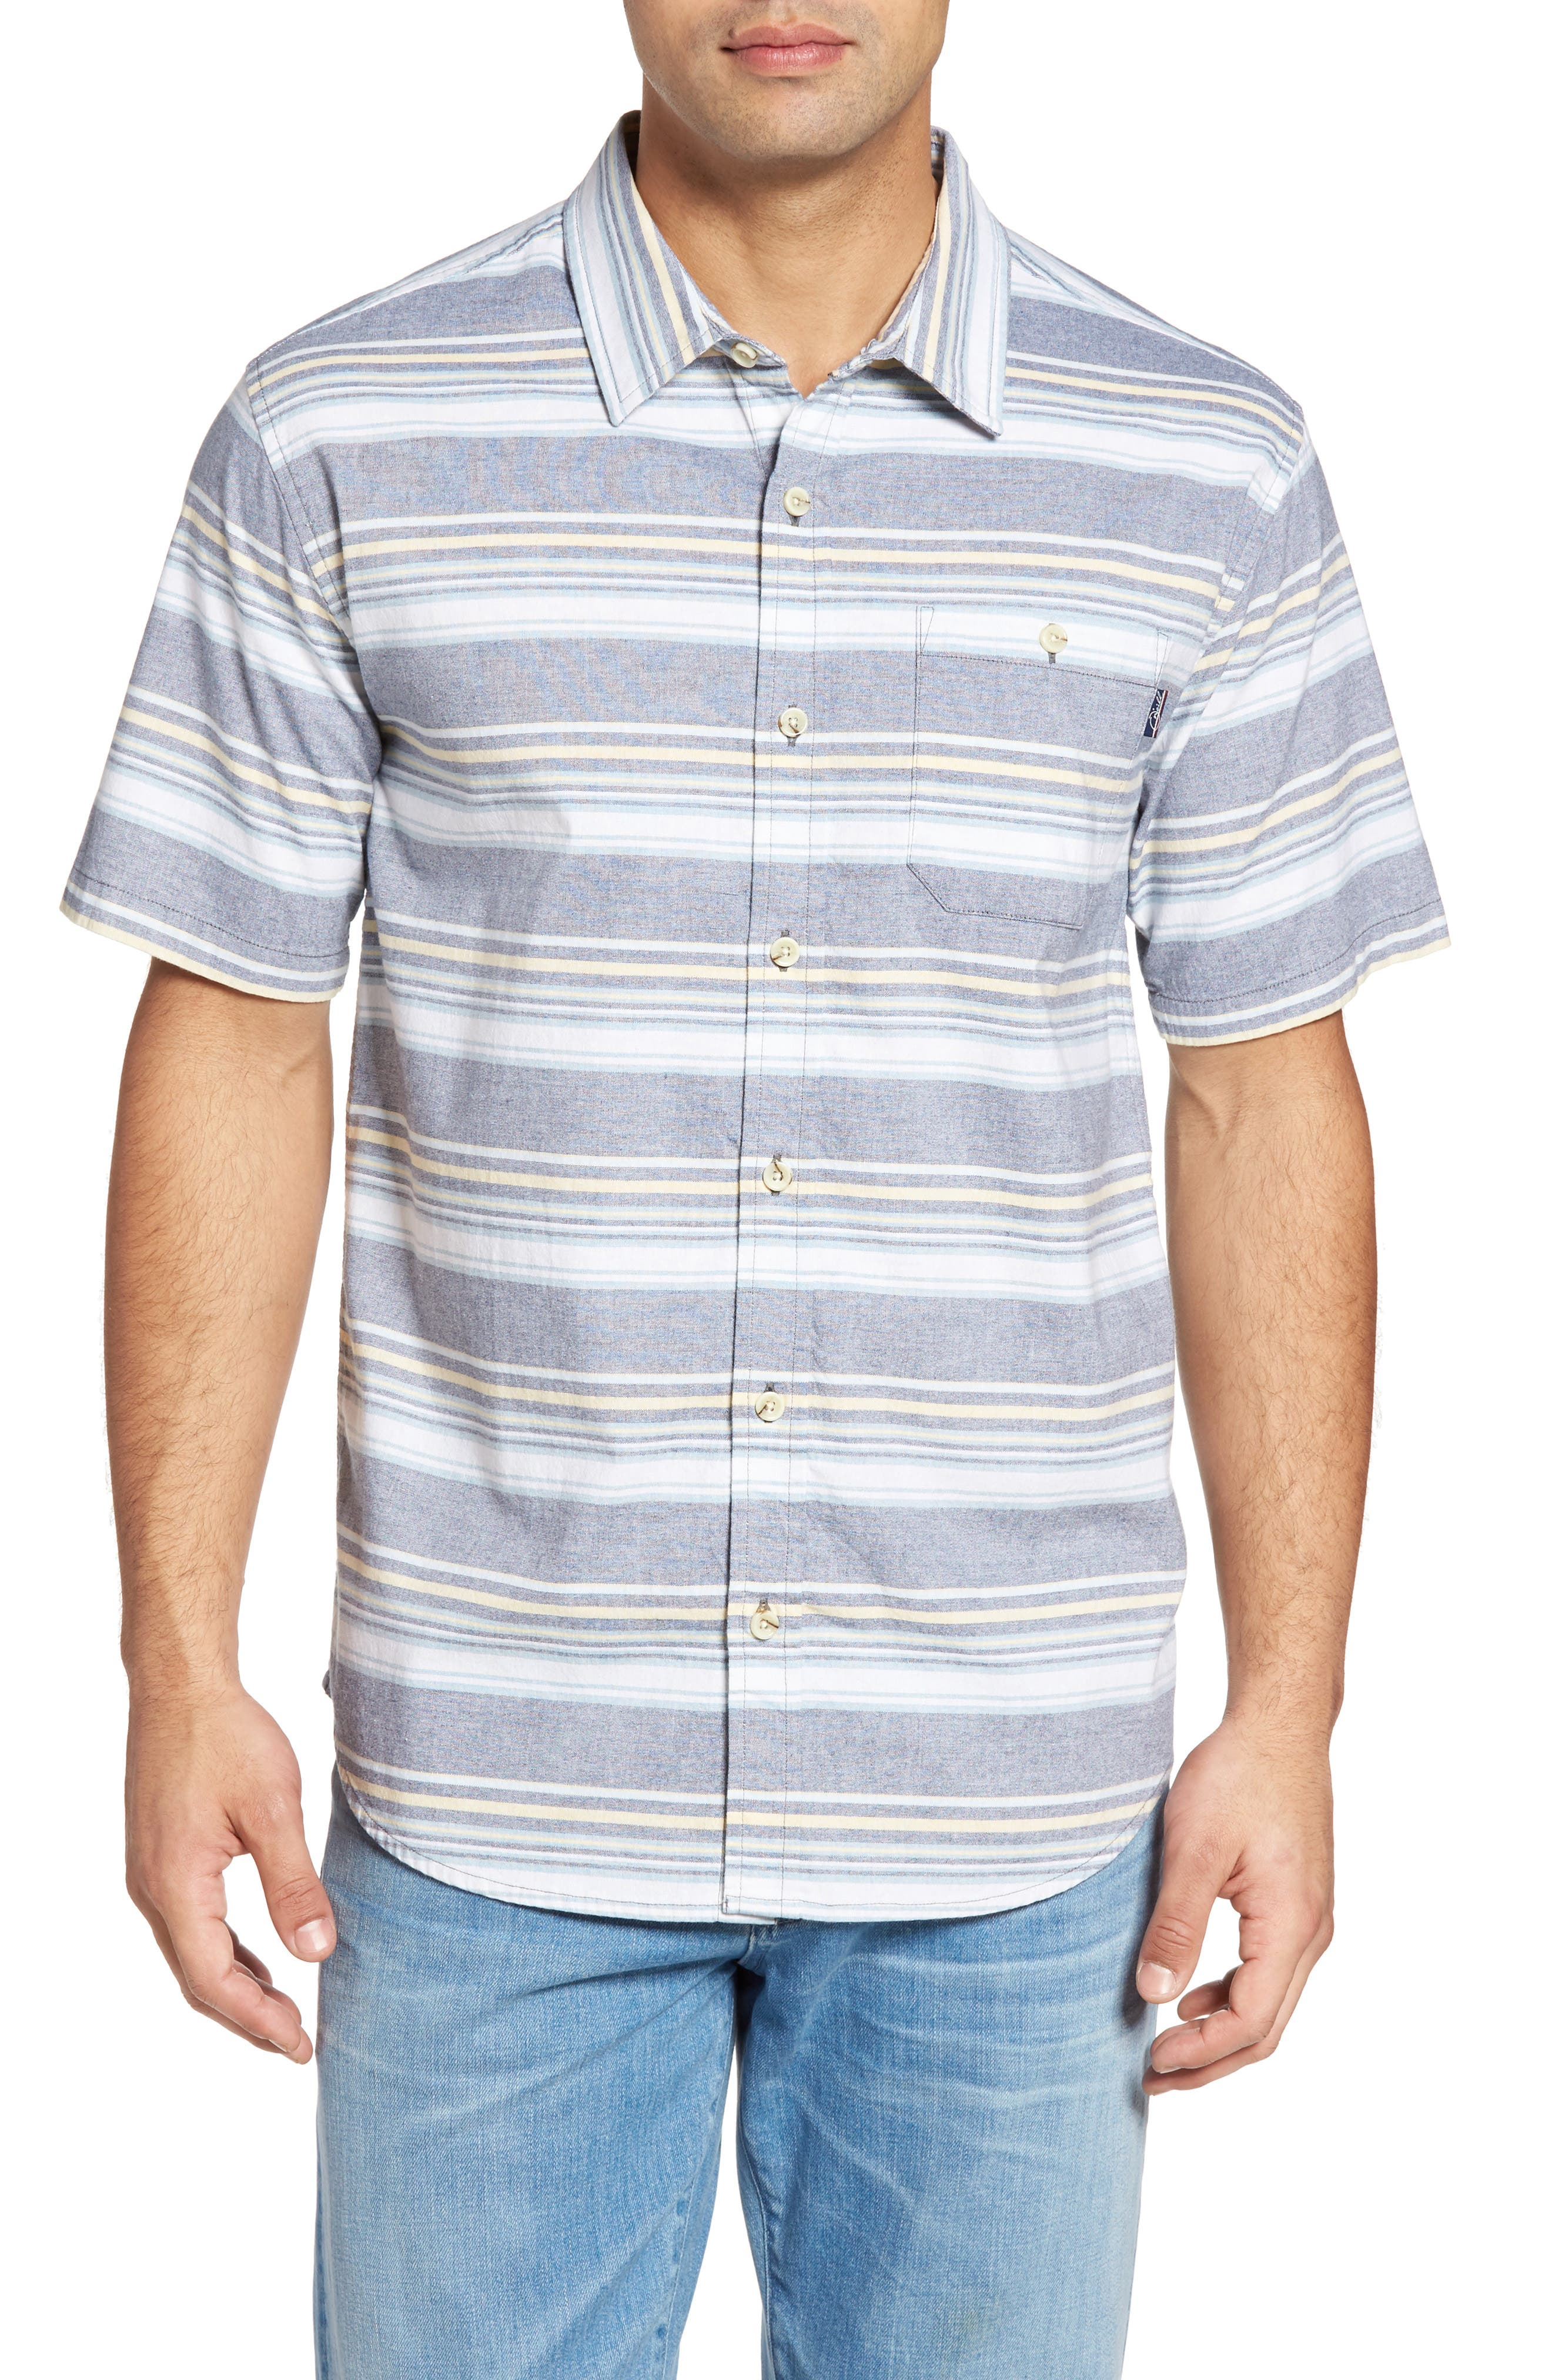 Pura Vida Sport Shirt,                         Main,                         color, Navy